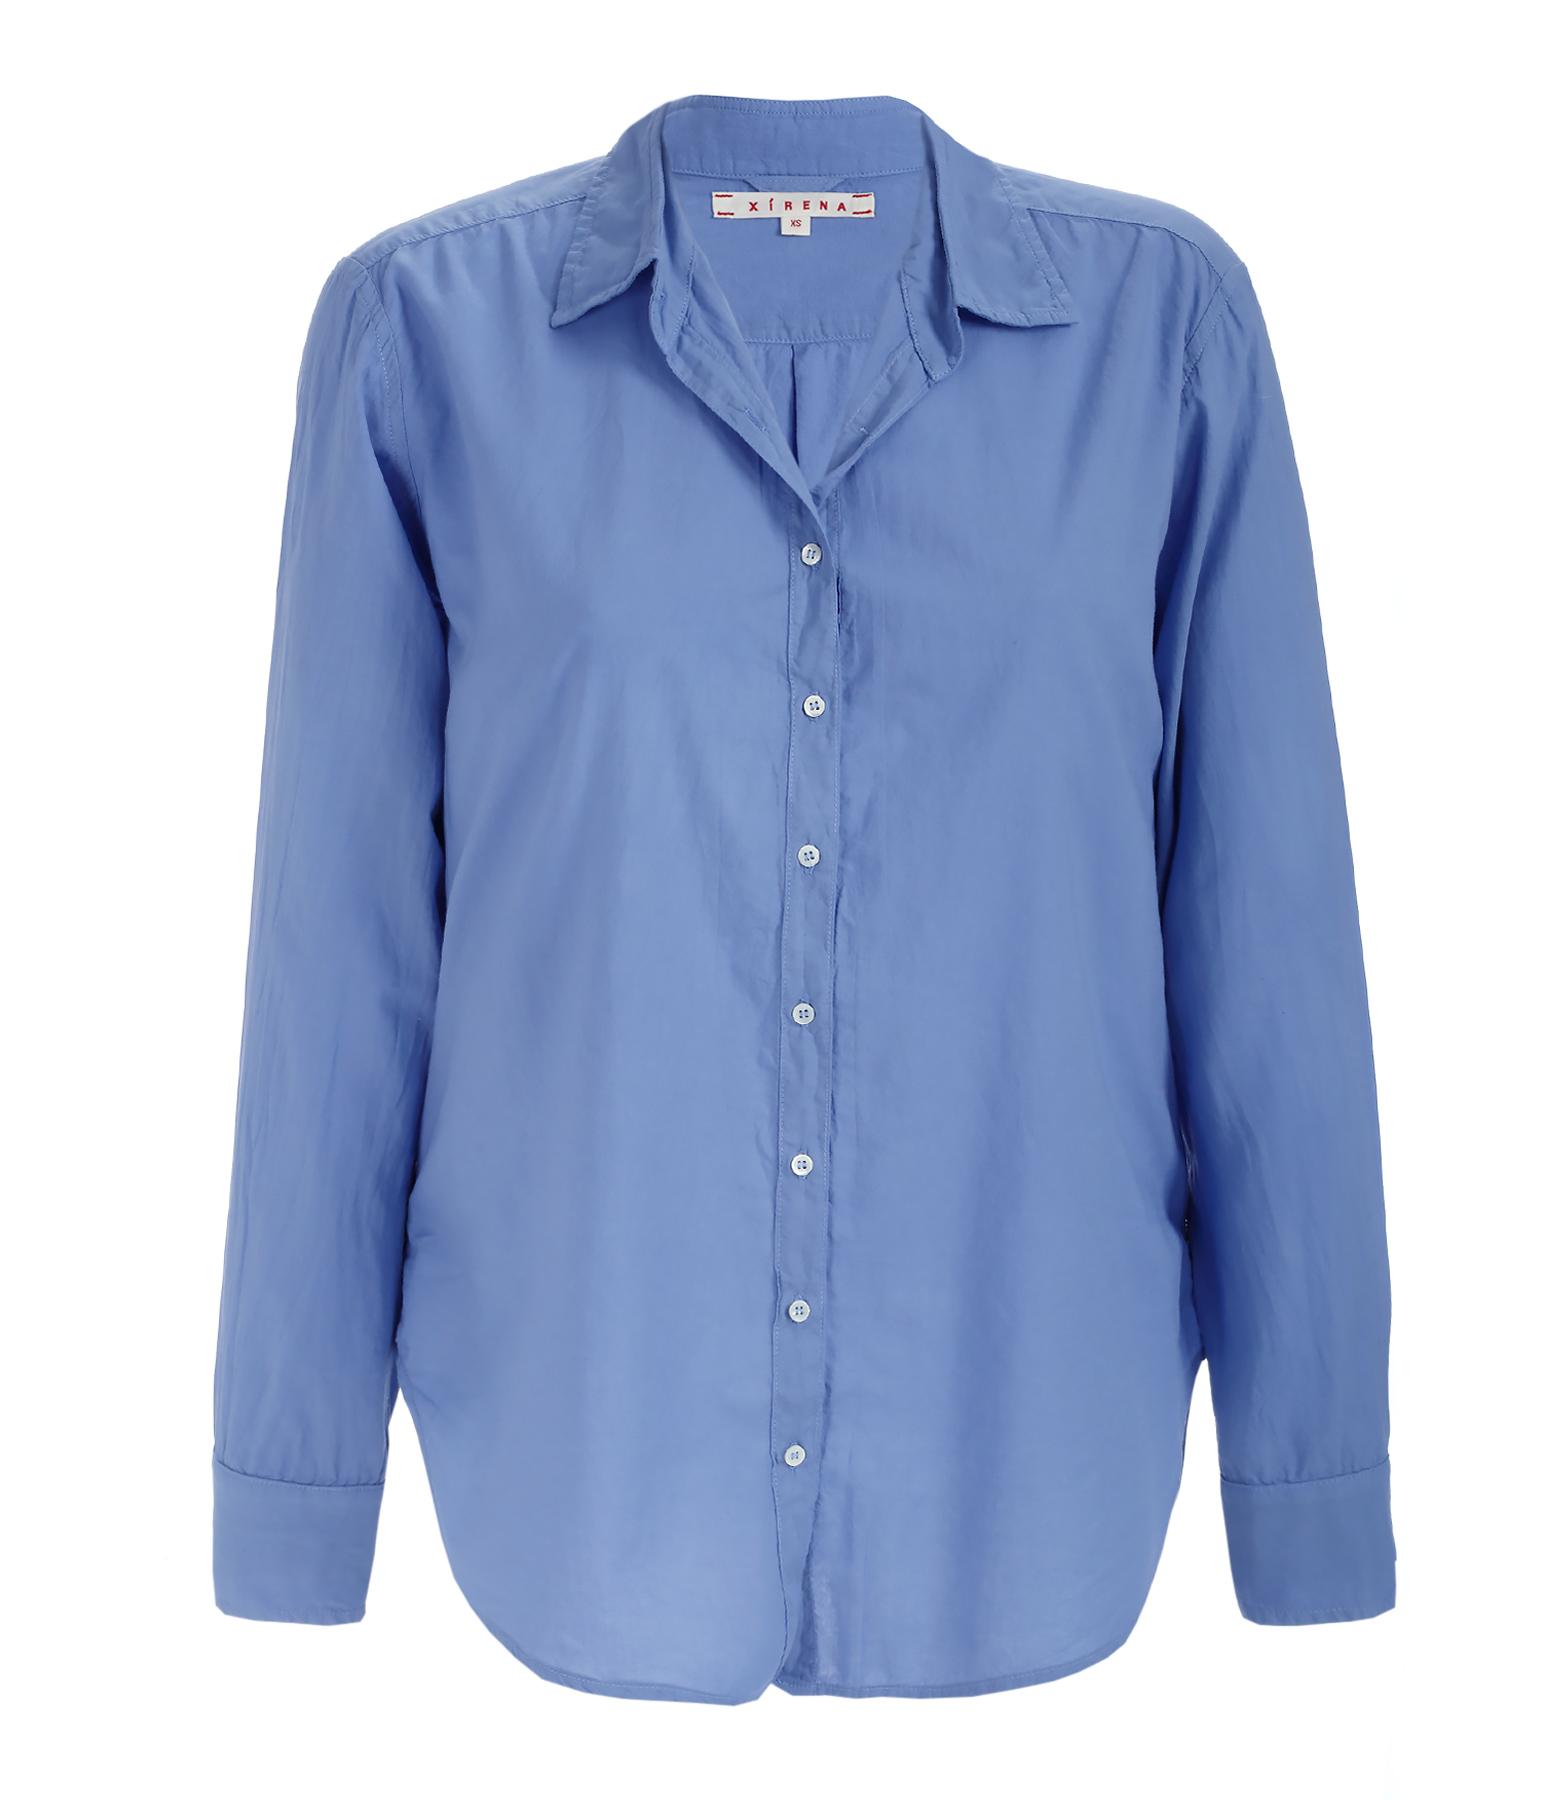 Chemise Cotton Poplin Beau Coton Voyage Bleu